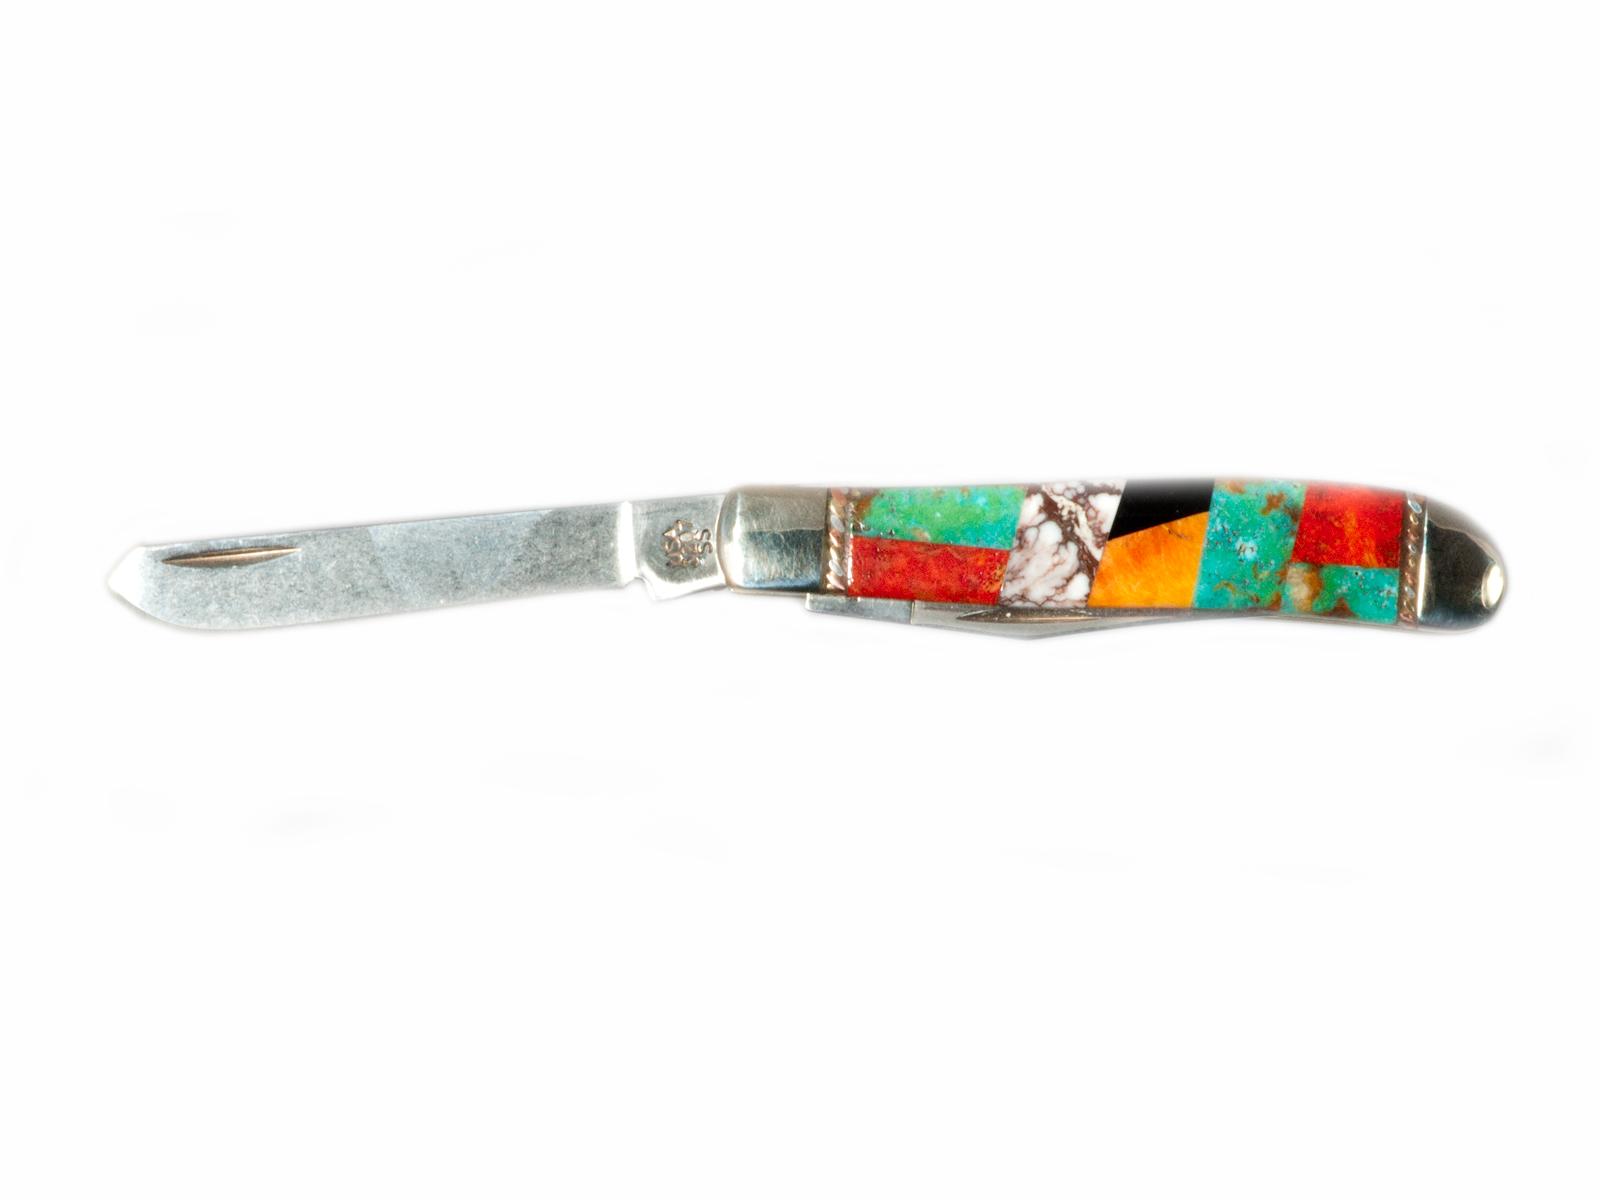 Handmade Mini Trapper Inlay Pocket Knife